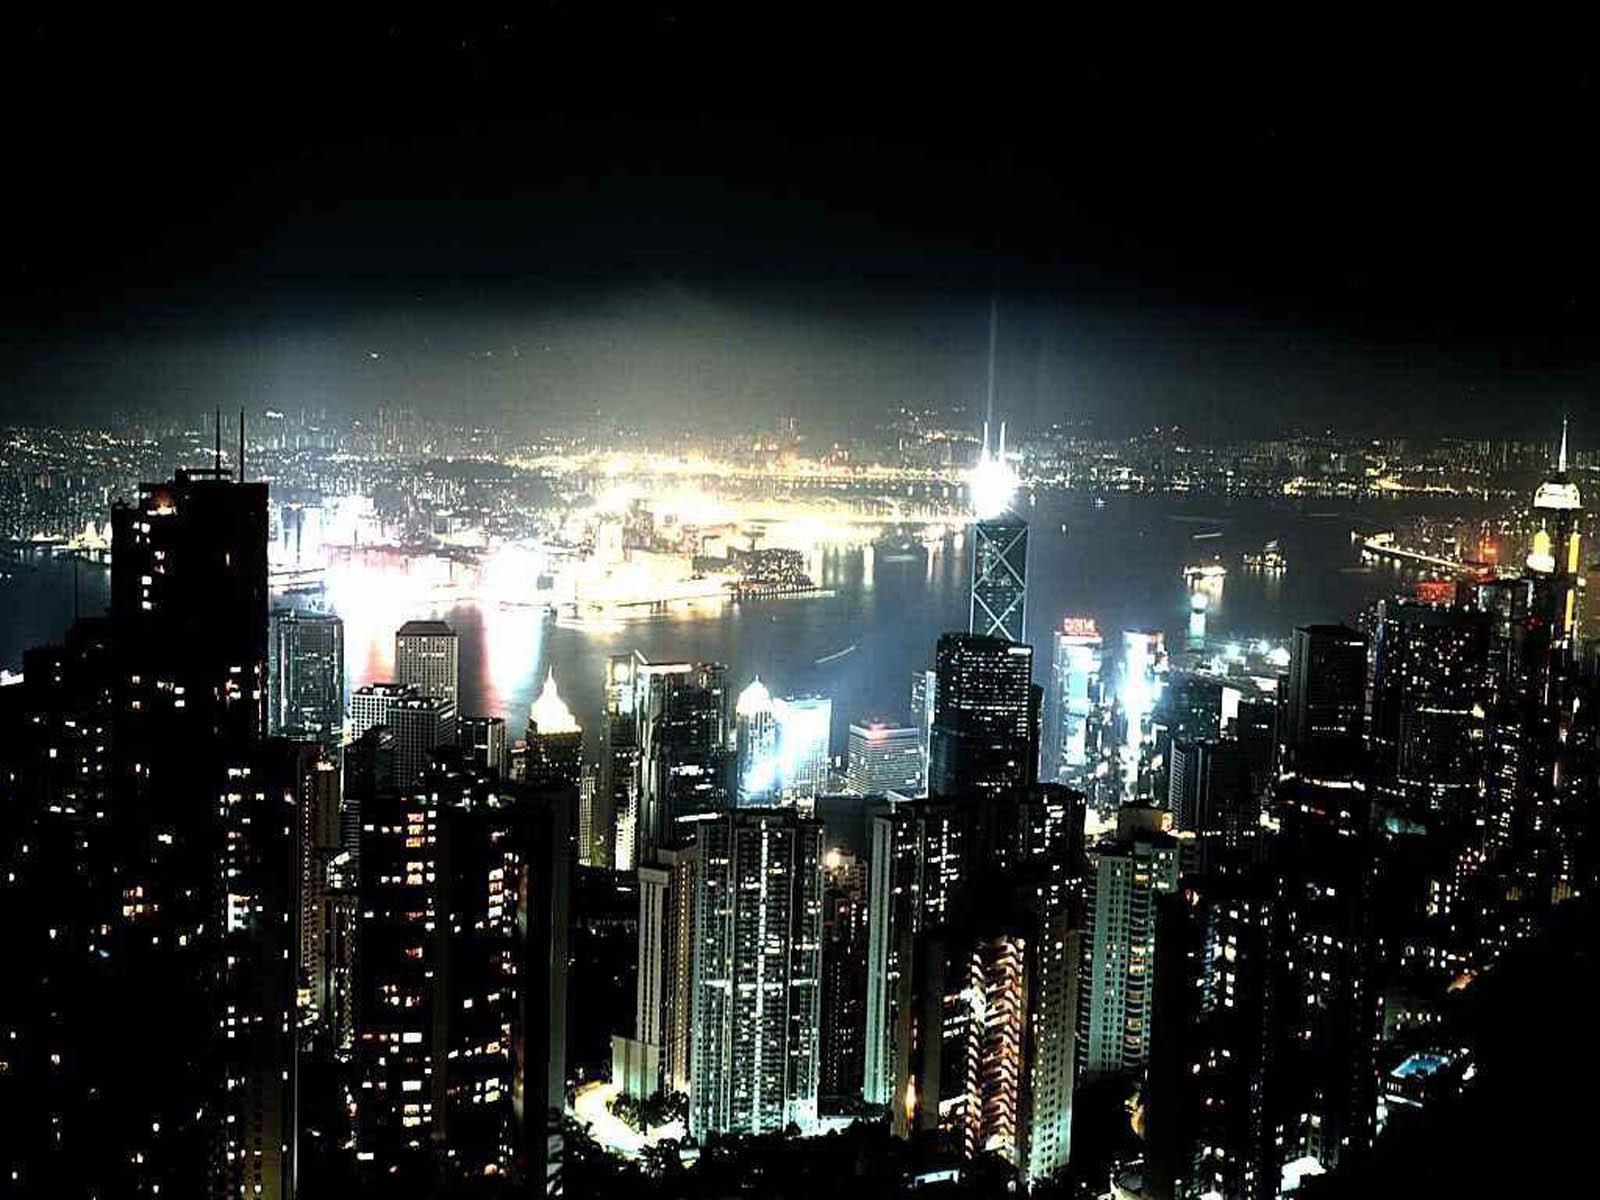 wallpapers: Night City Glow